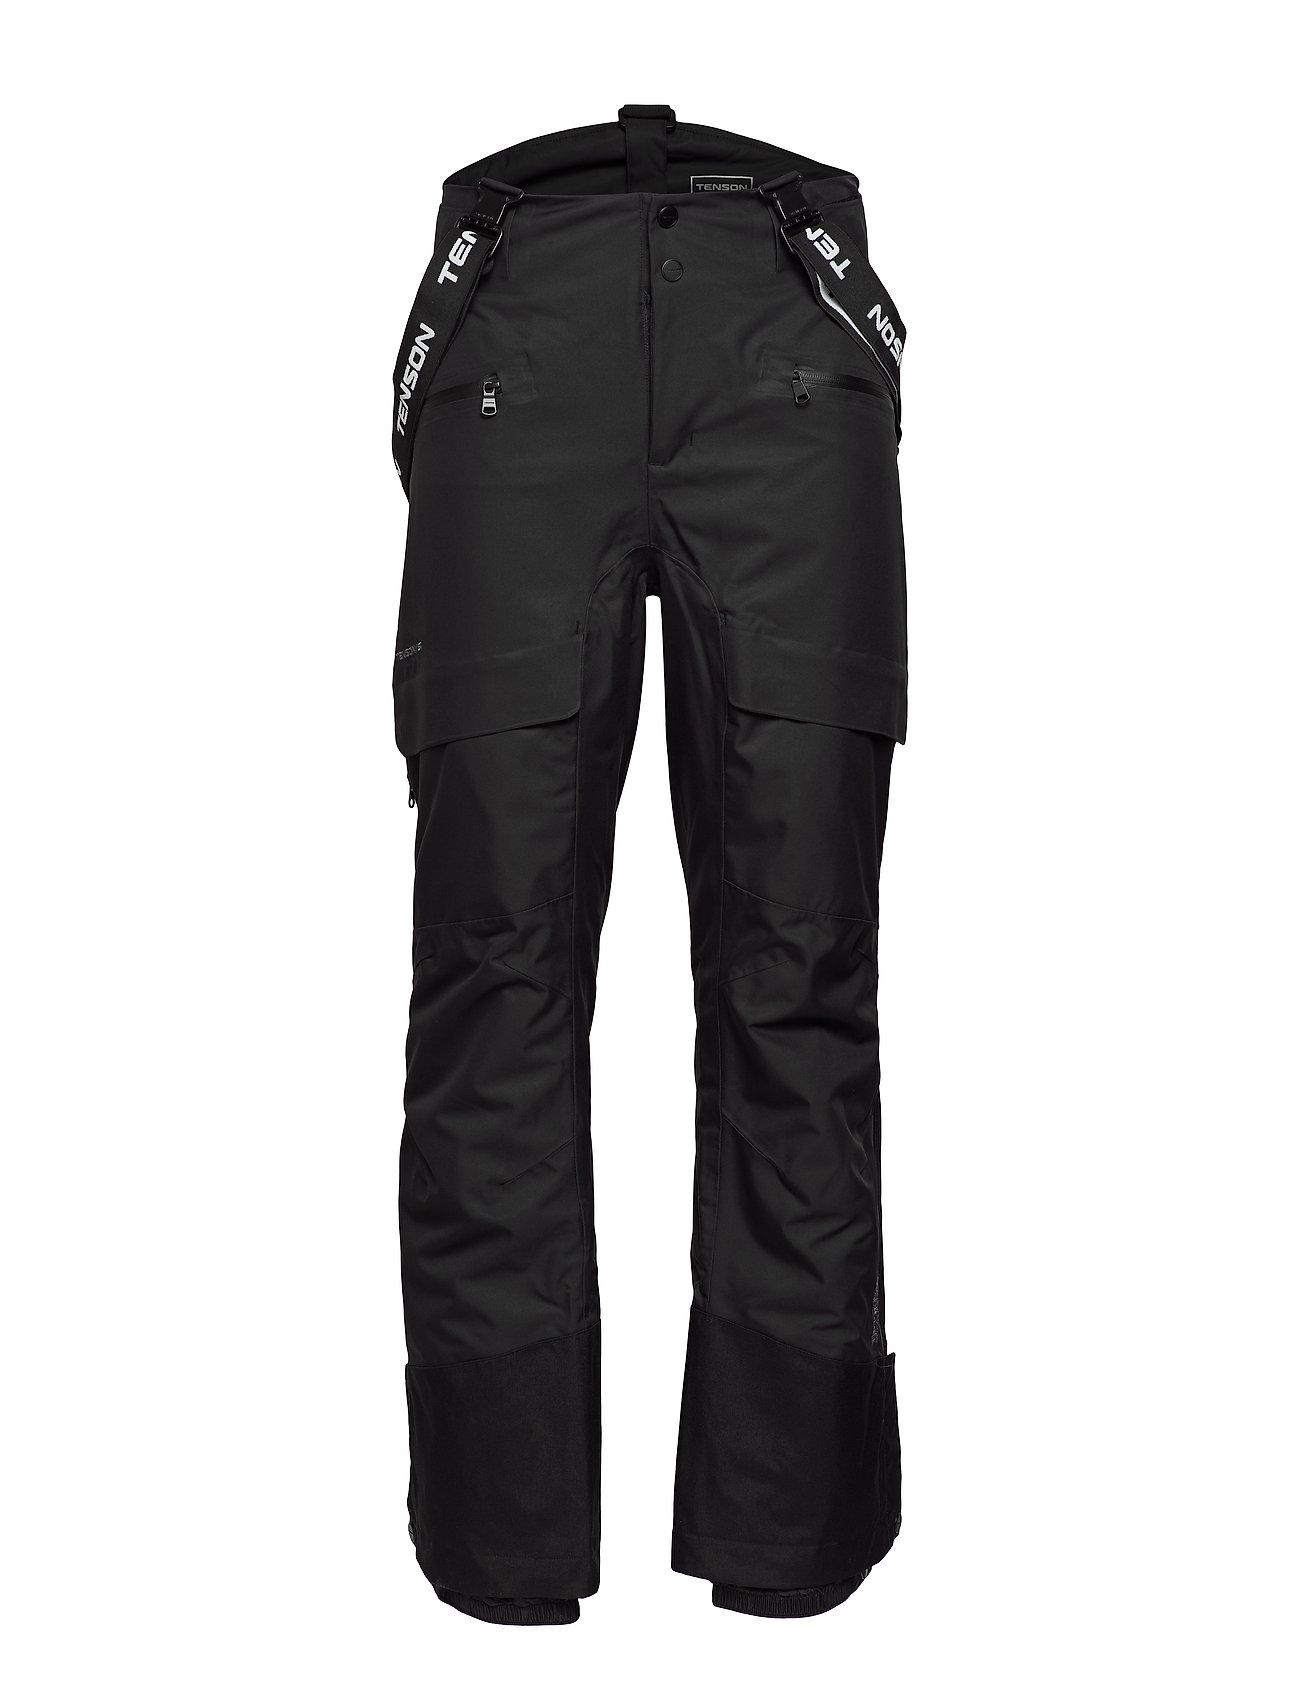 Image of Samir Sport Pants Sort Tenson (3270673165)